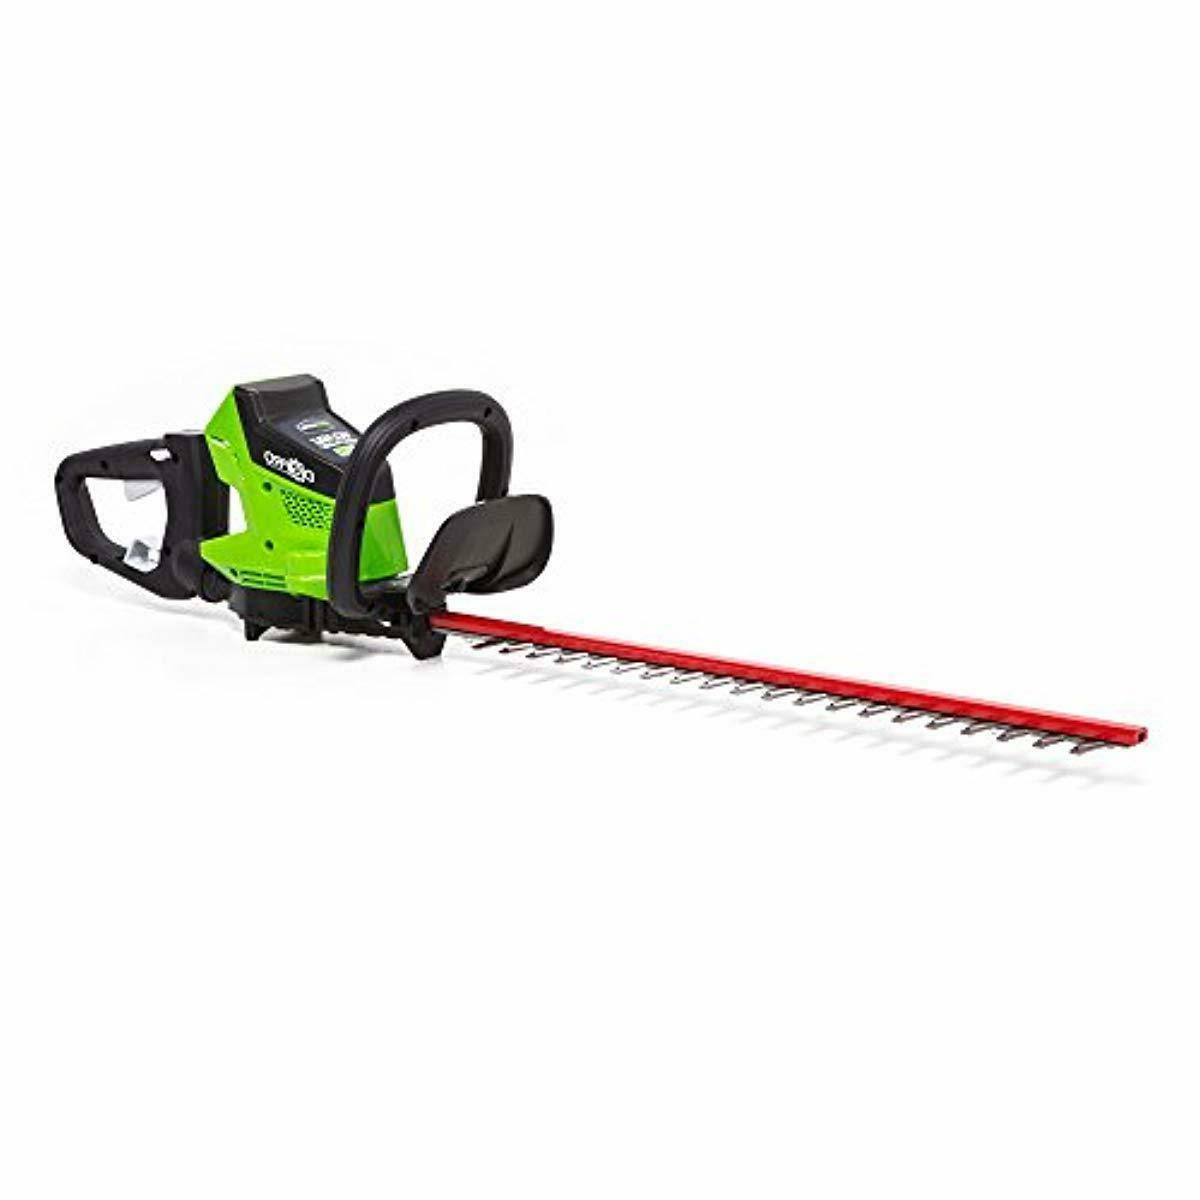 ht40l00 brushless cordless hedge trimmer 24 battery